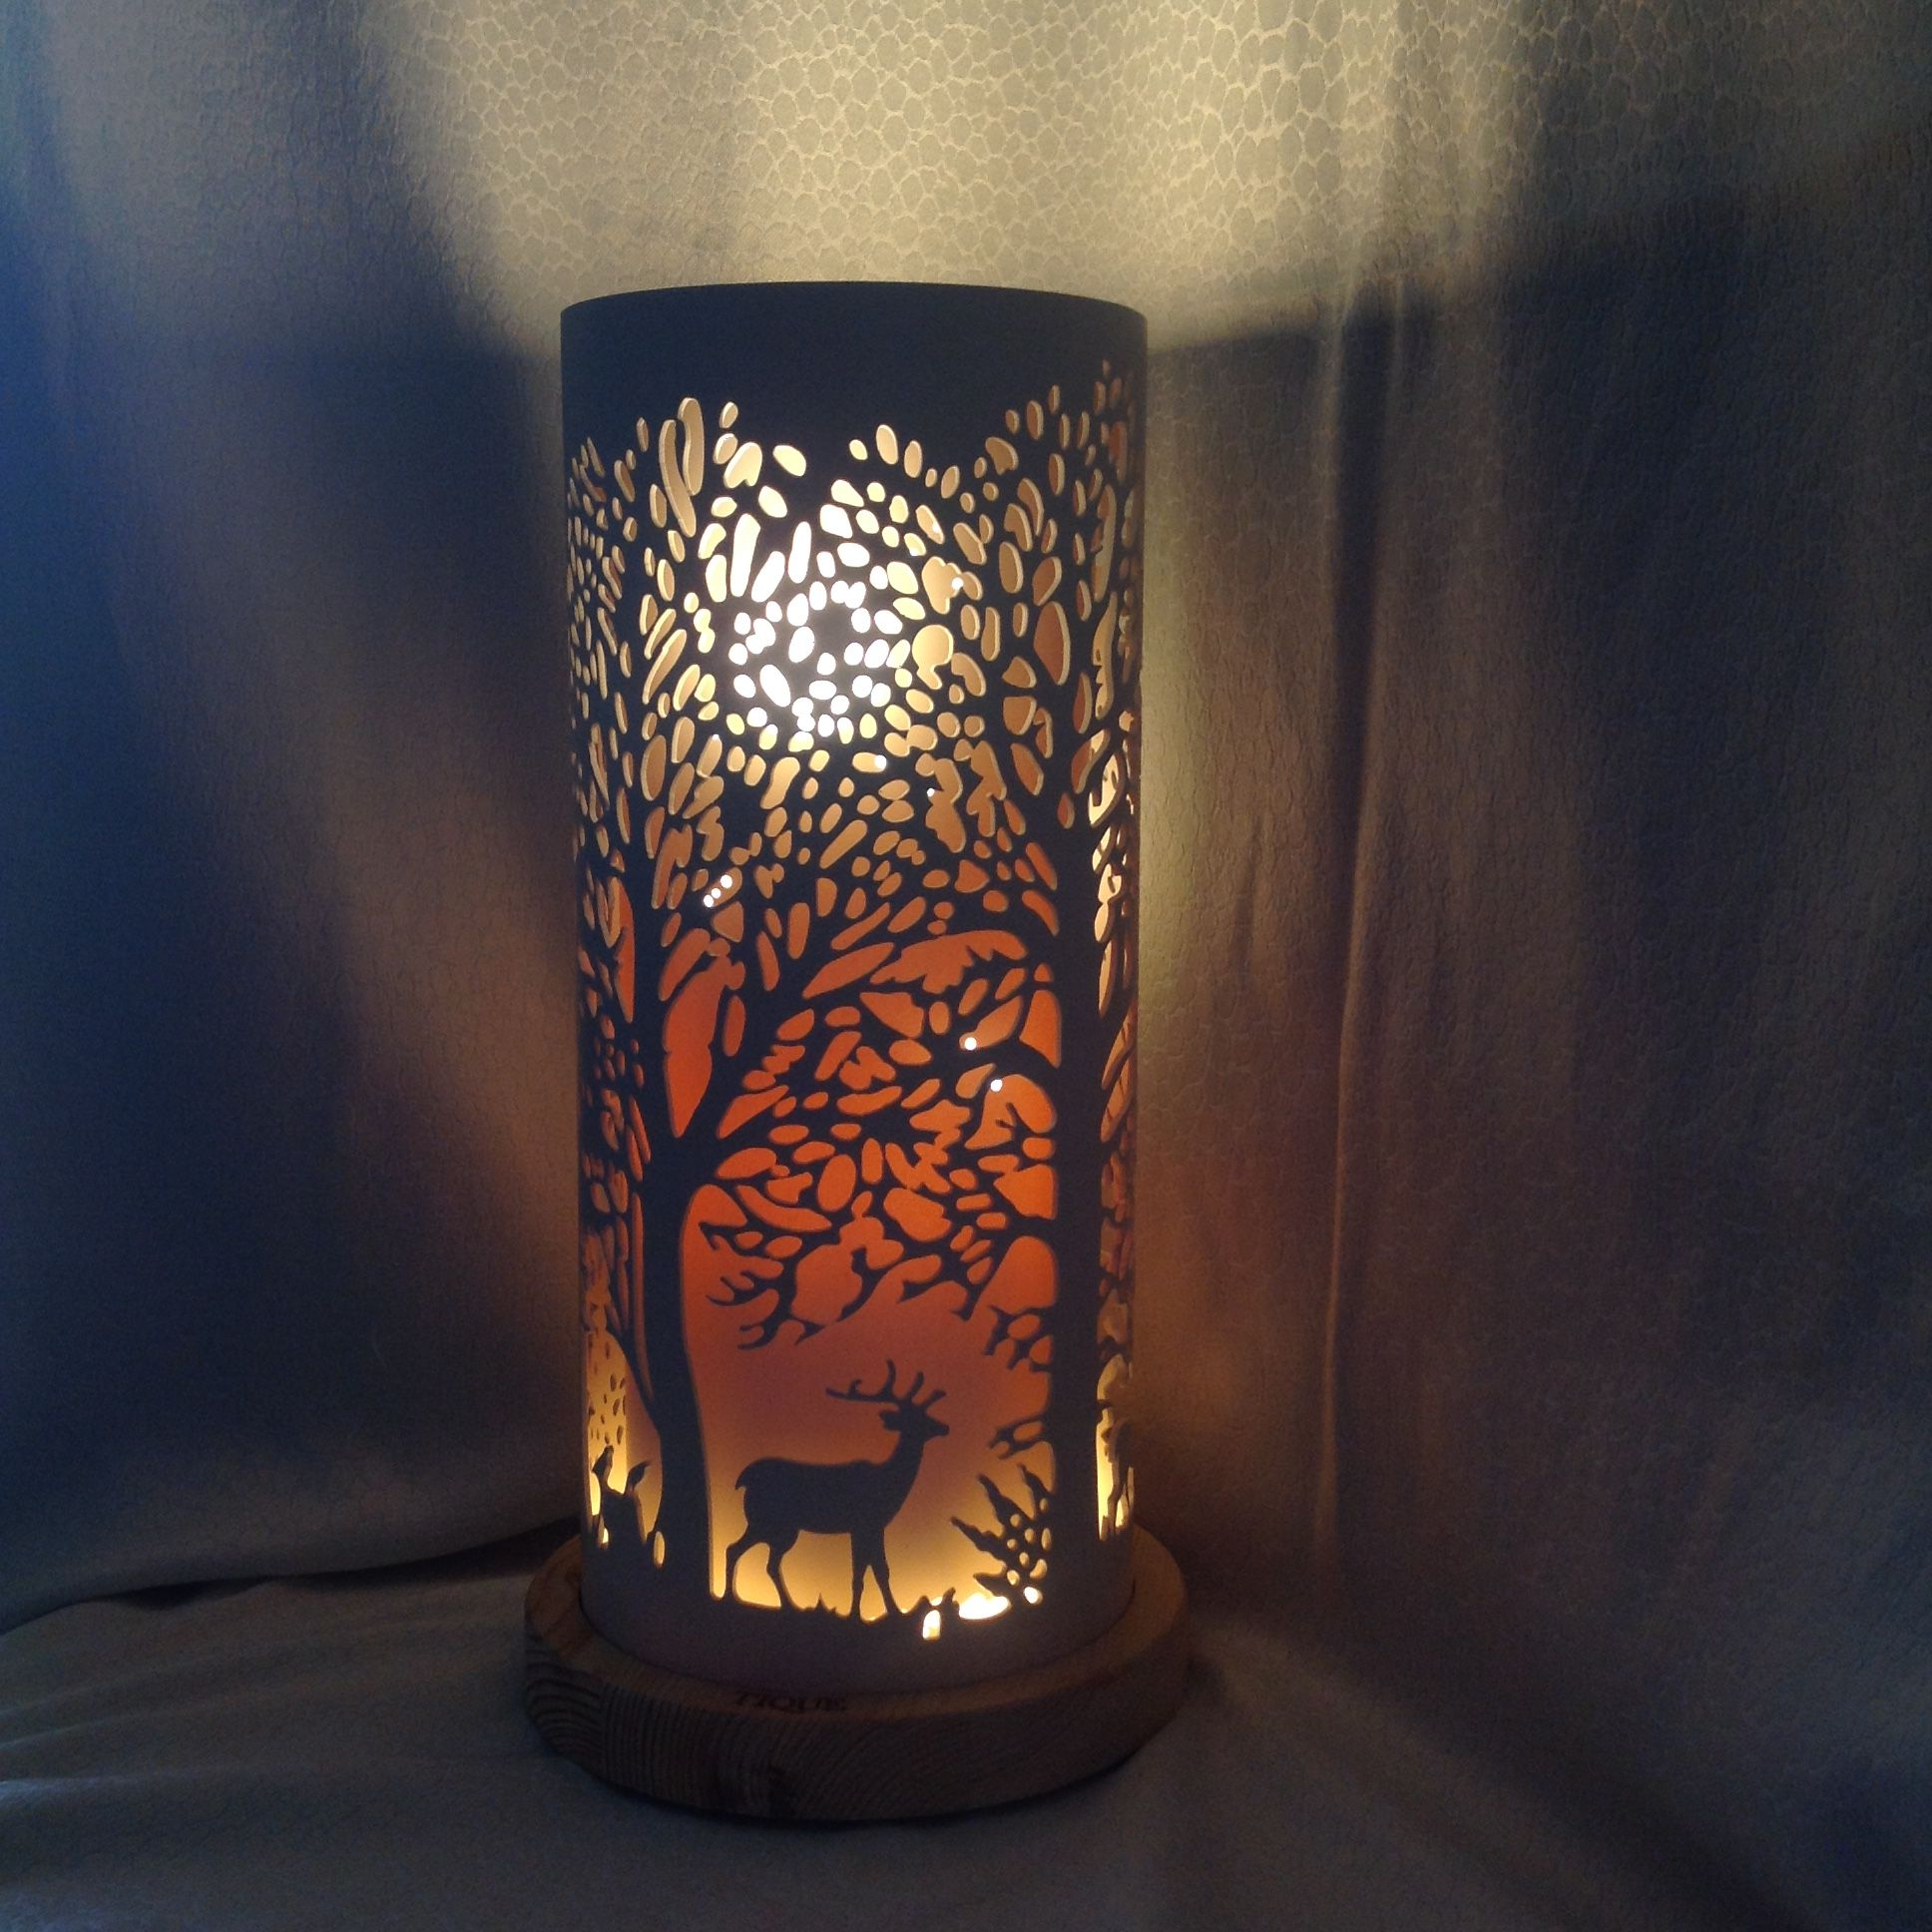 картинки для светильника из пластика